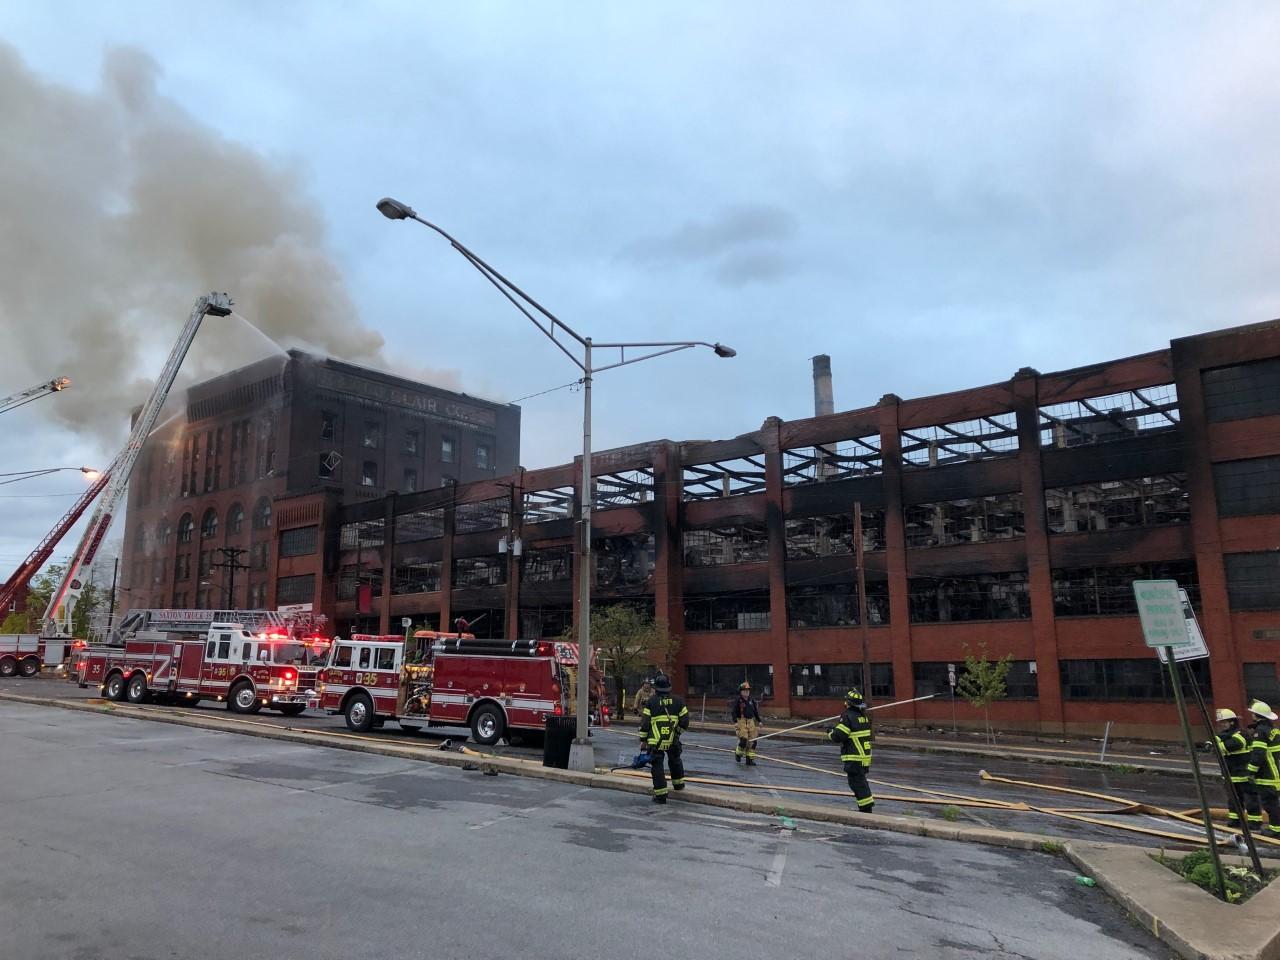 Huntingdon Pa 2020 Halloween Massive fire destroys Huntingdon building, leaves 59 displaced